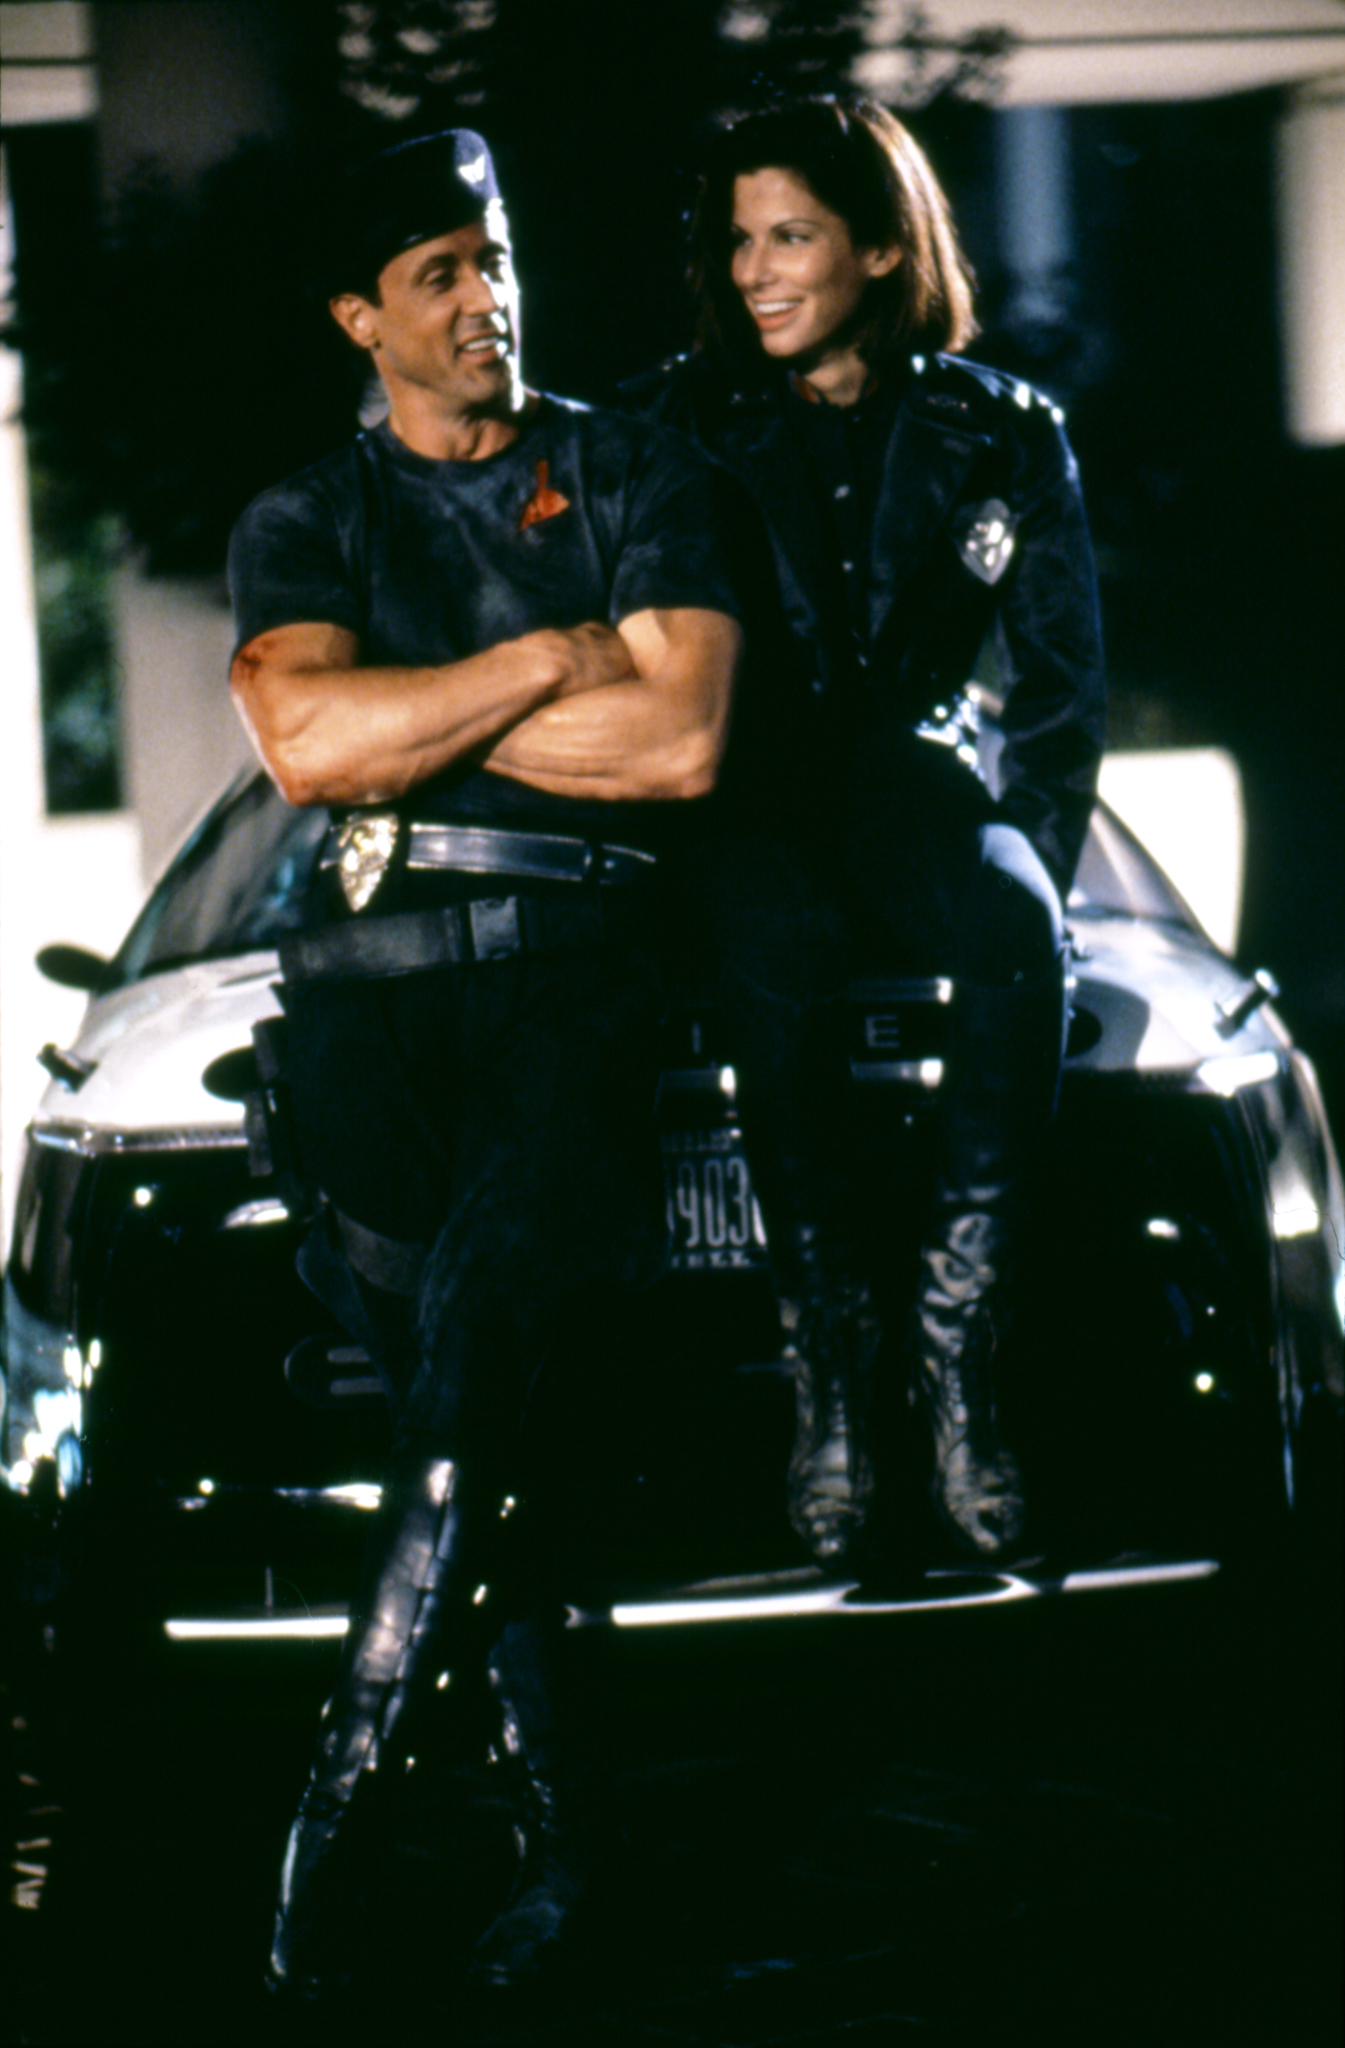 Sandra Bullock and Sylvester Stallone in Demolition Man (1993)